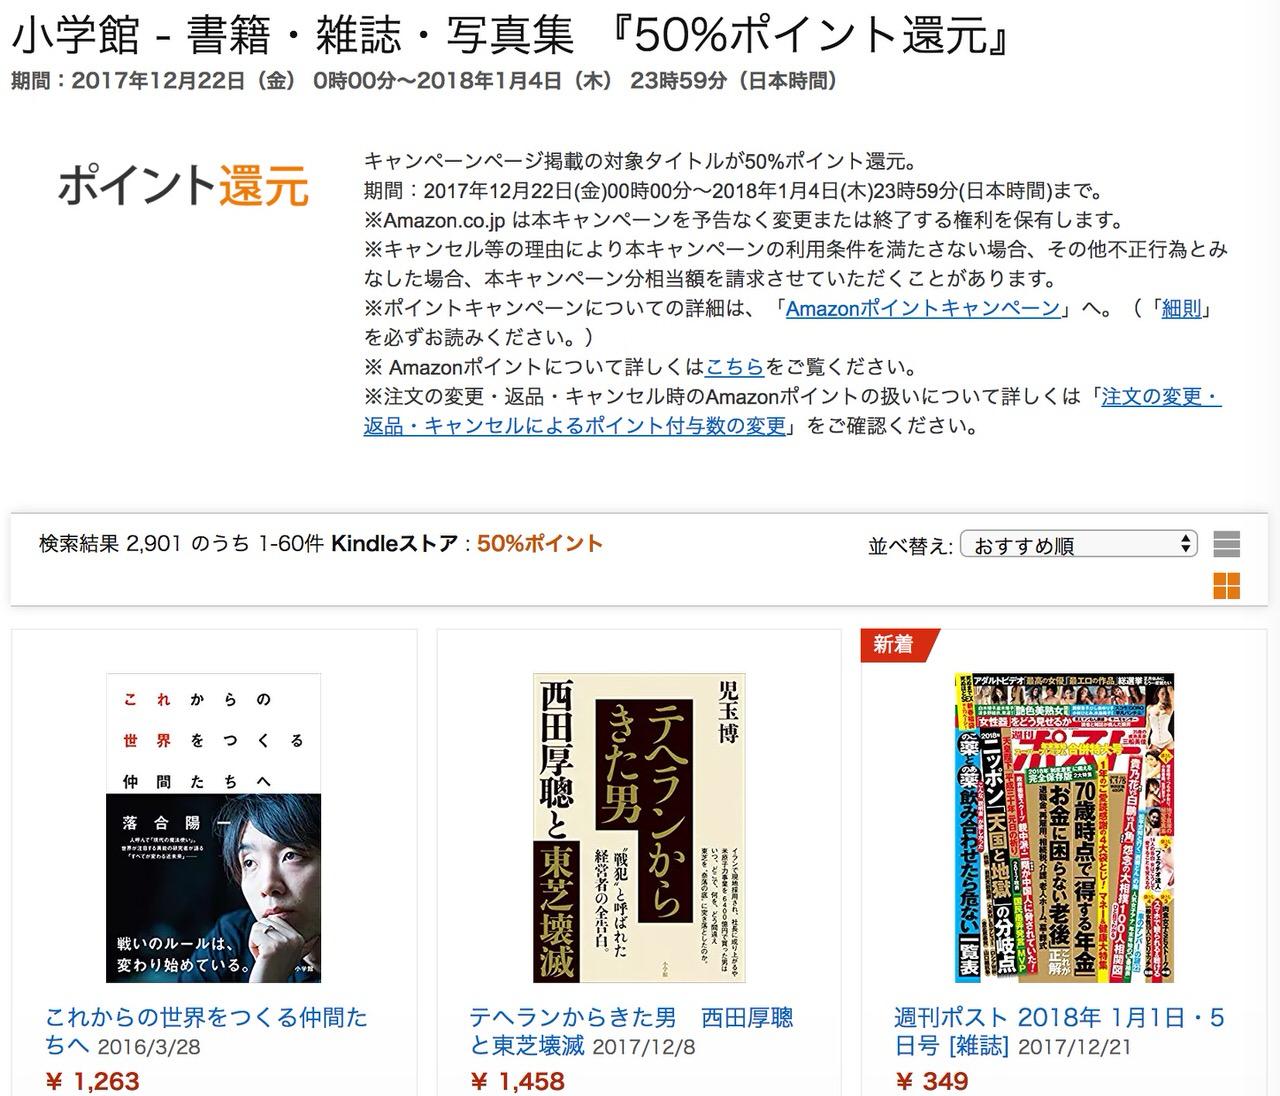 【Kindleセール】小学館 - 書籍・雑誌・写真集「50%ポイント還元」セール実施中(1/4まで)